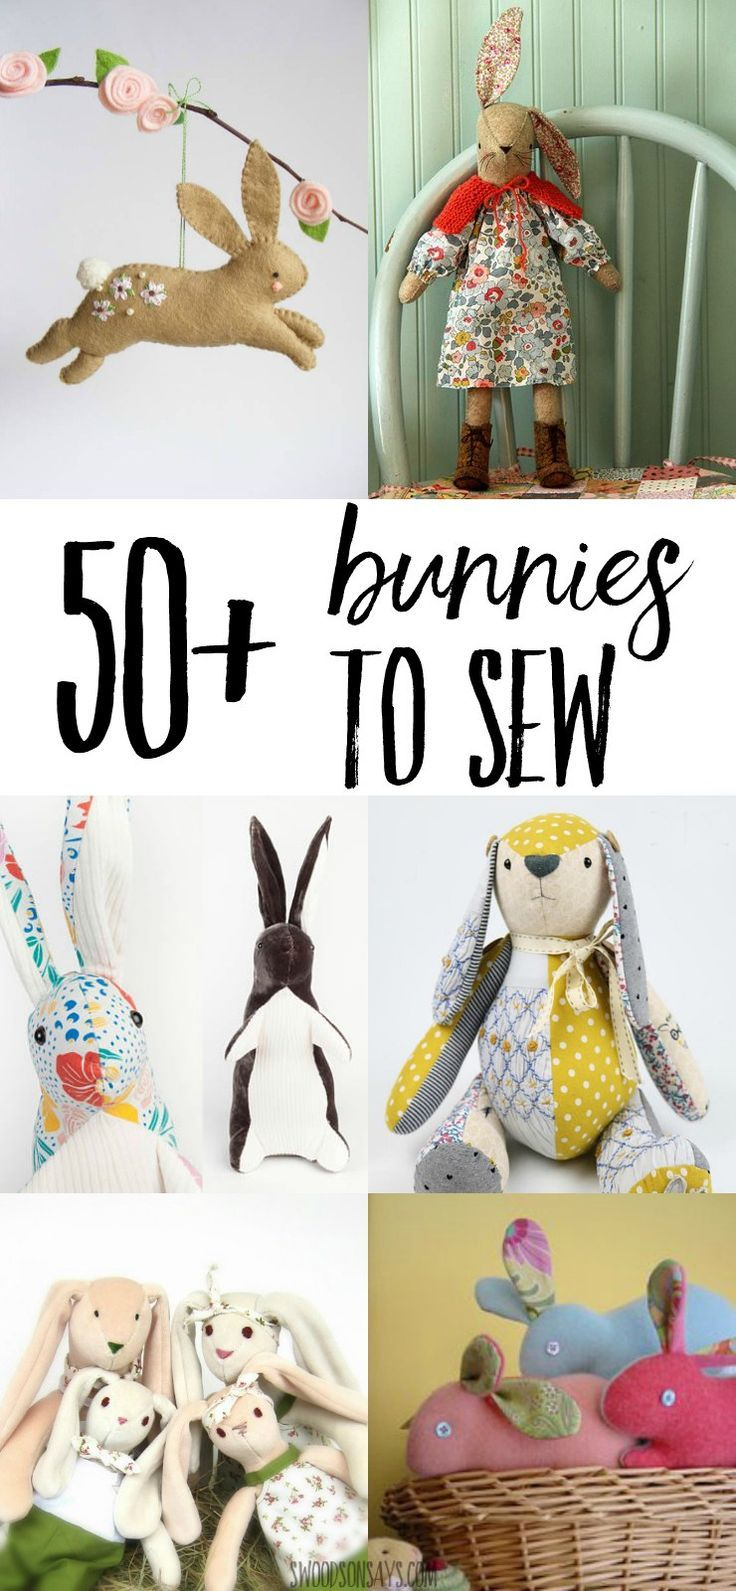 50+ Stuffed Bunny Sewing Patterns | Manualidades | Pinterest ...